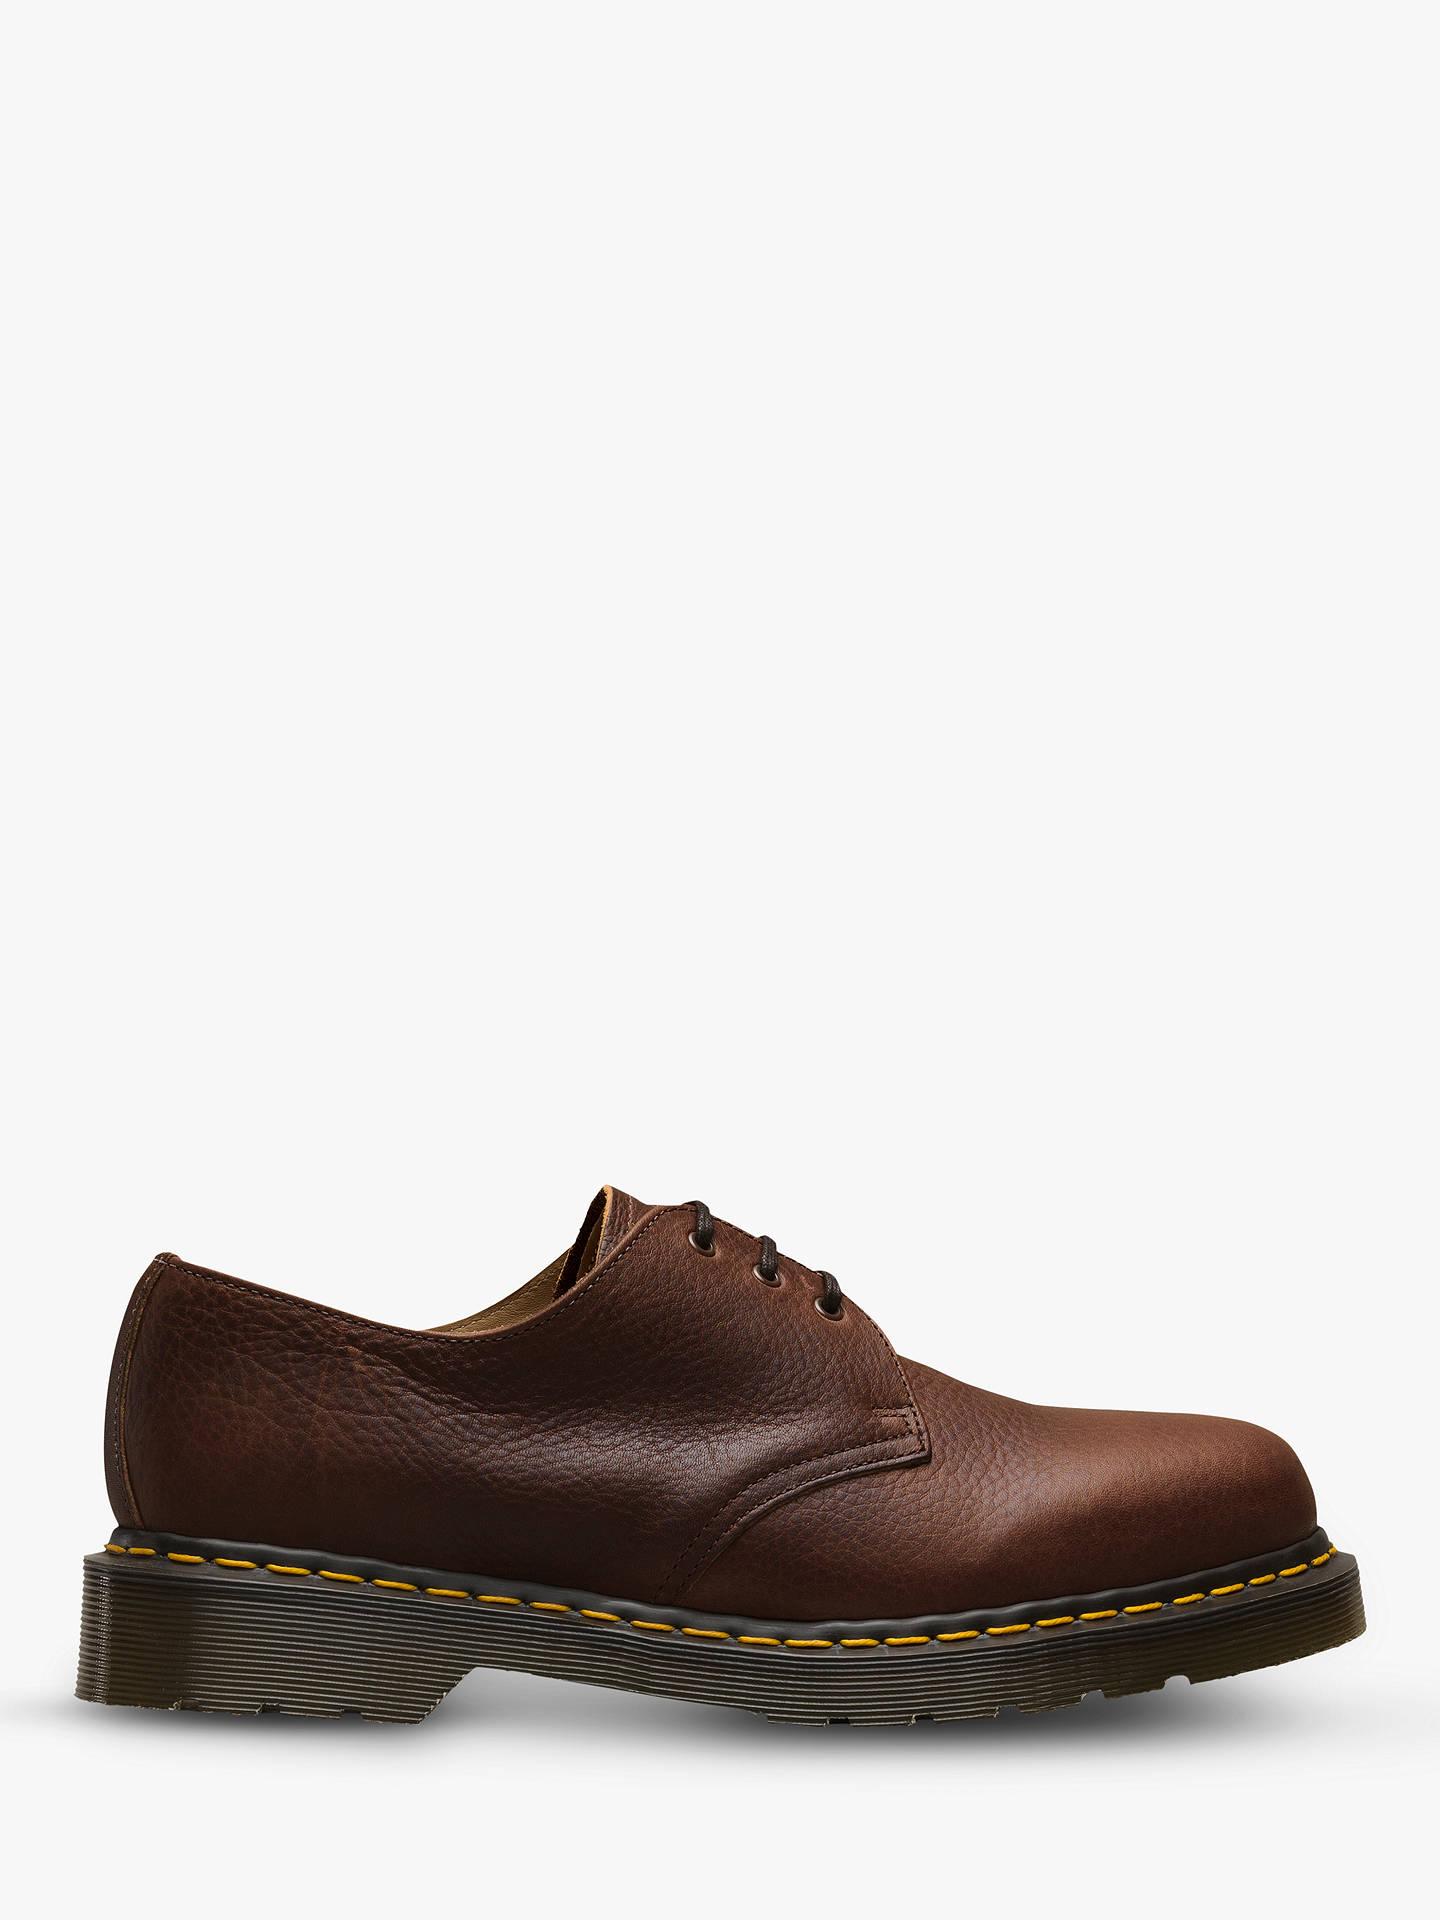 Dr Martens Made In England 1461 Vintage Derby Shoes, Abandon